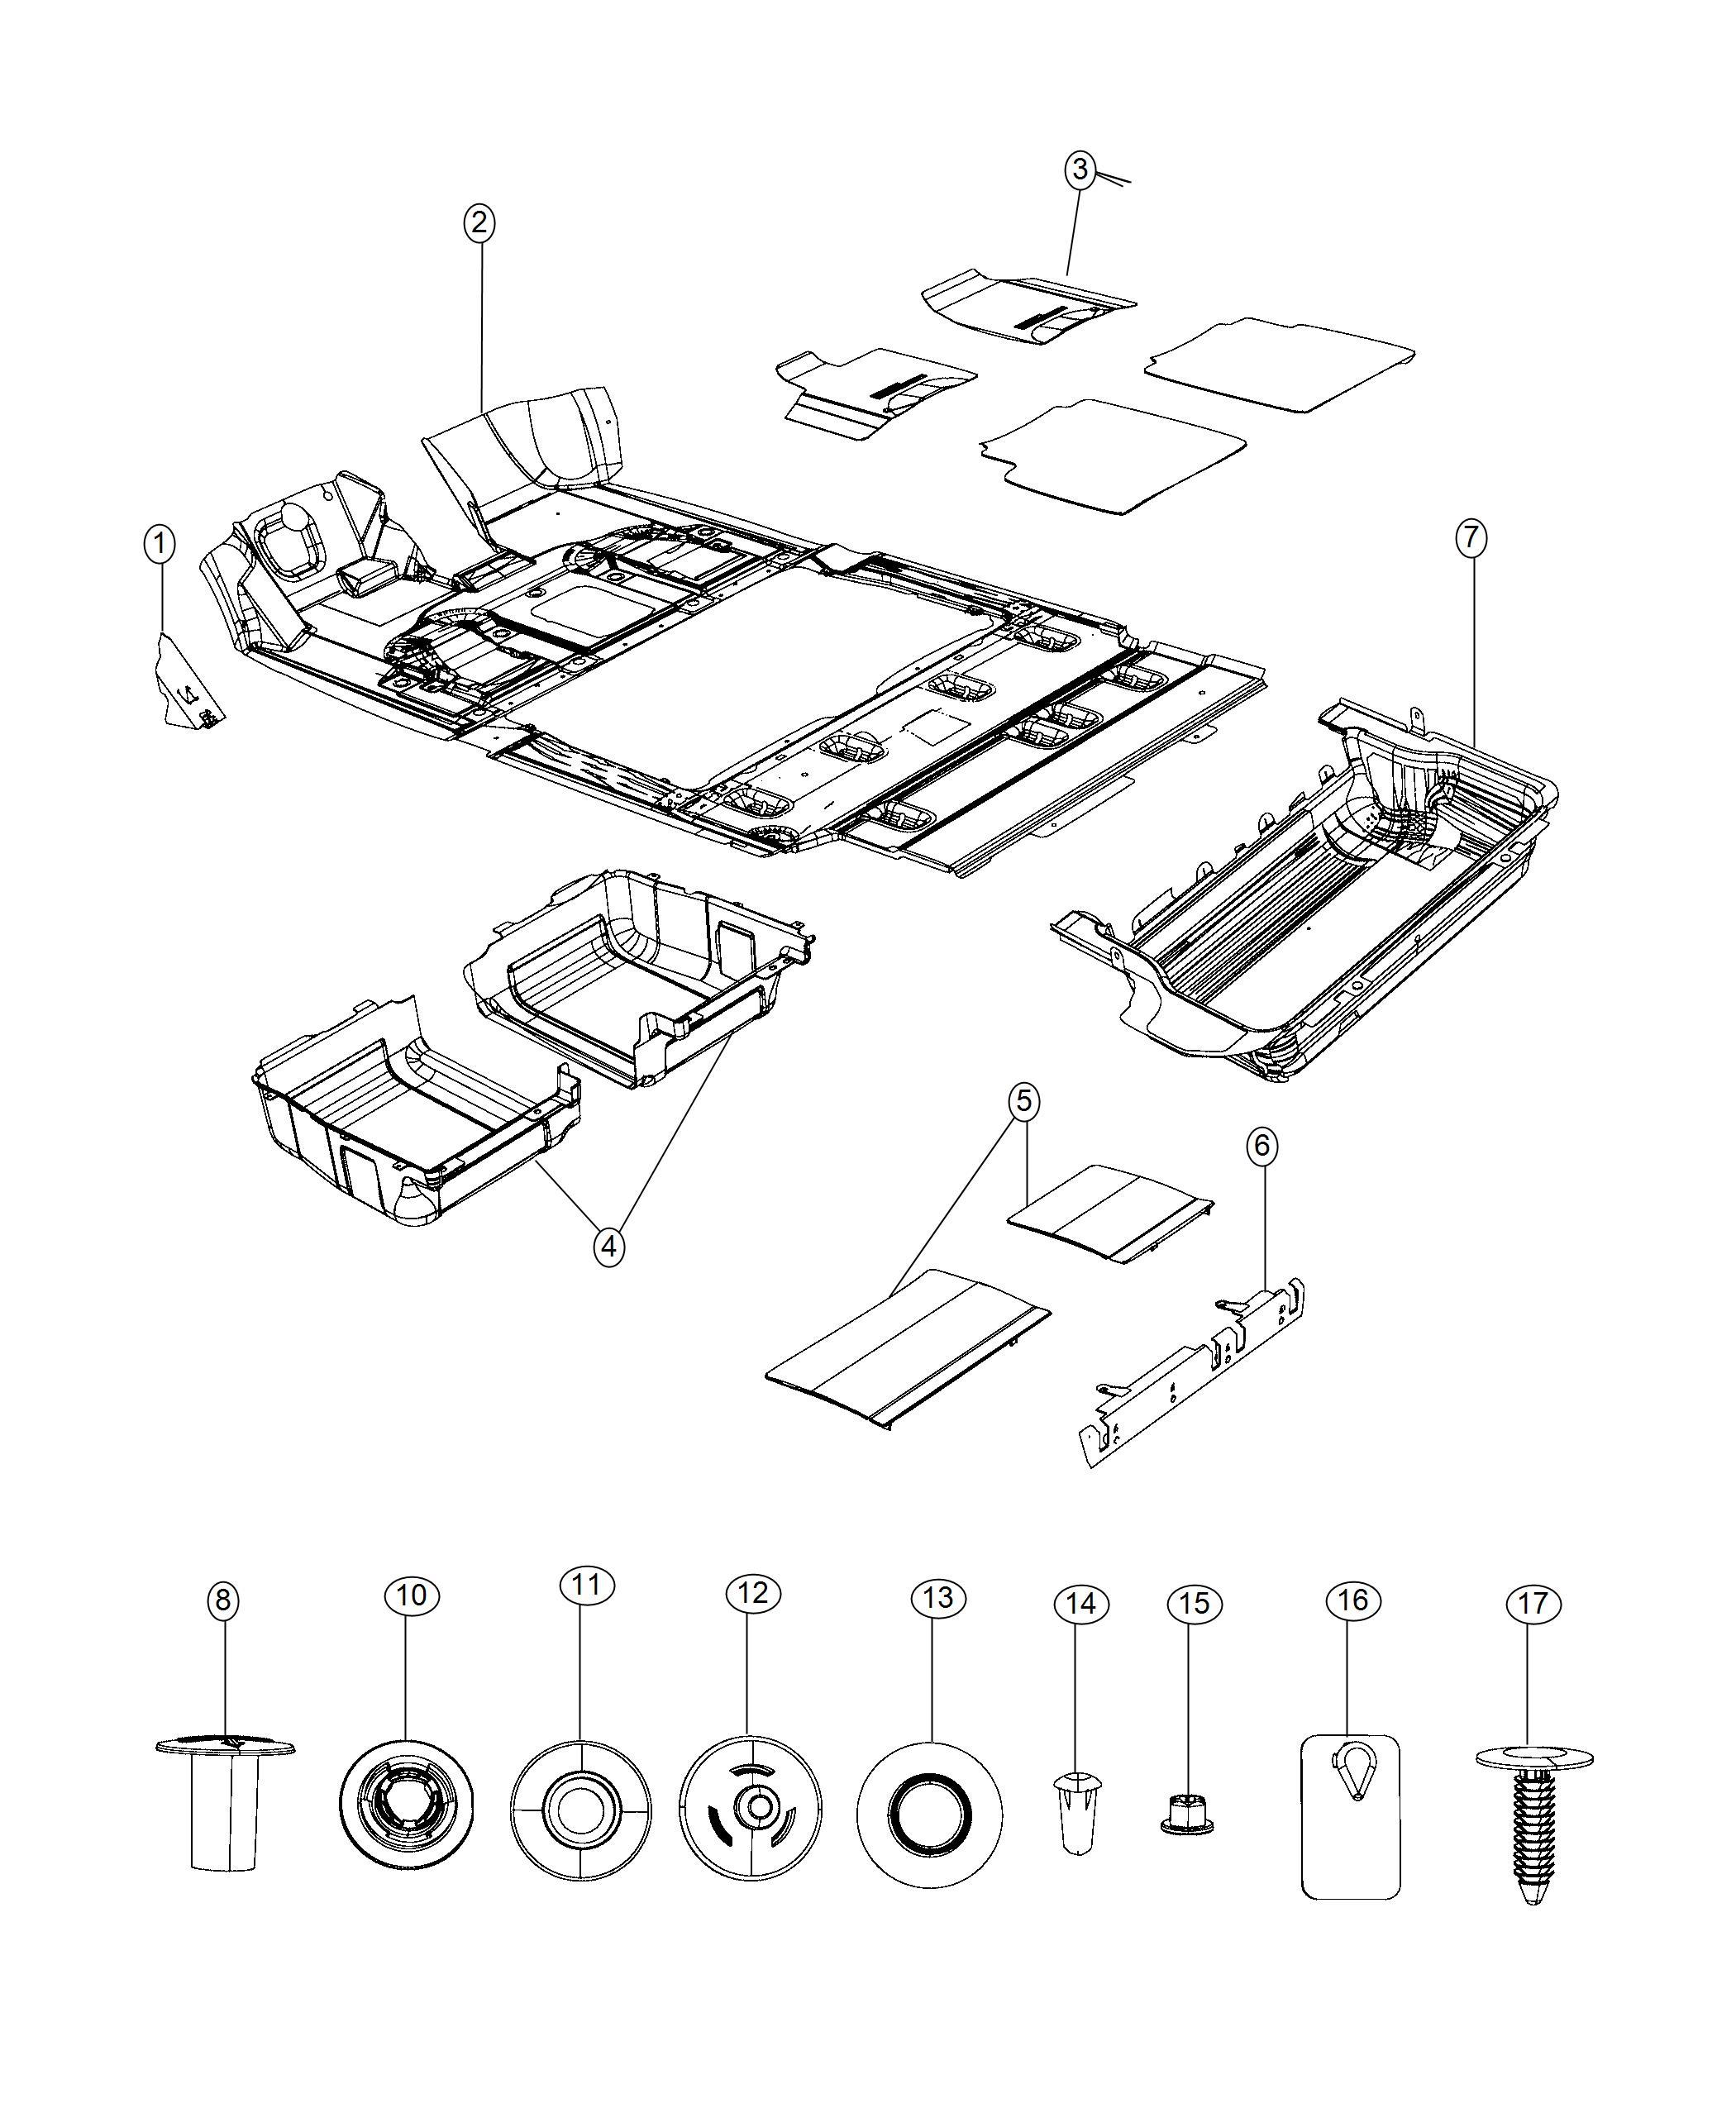 Dodge Grand Caravan Se 3 6l V6 Cover Plug Spare